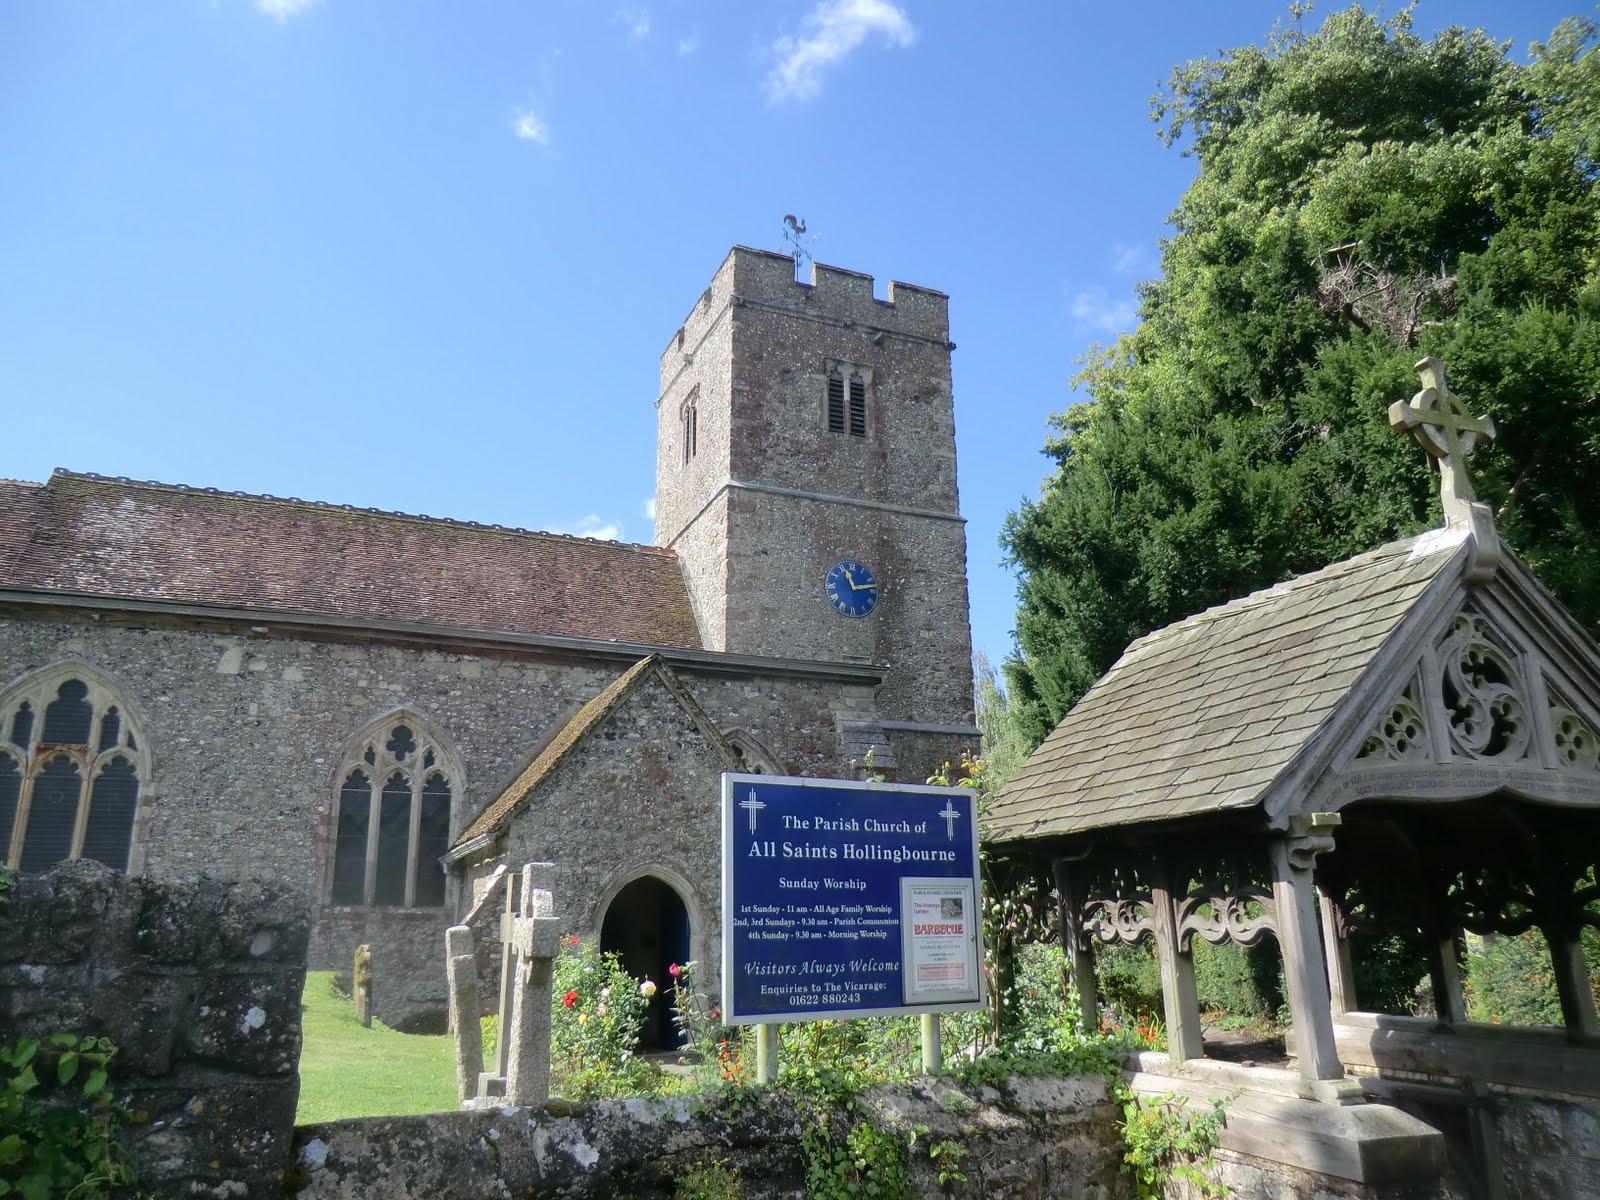 CIMG4181 All Saints church, Hollingbourne